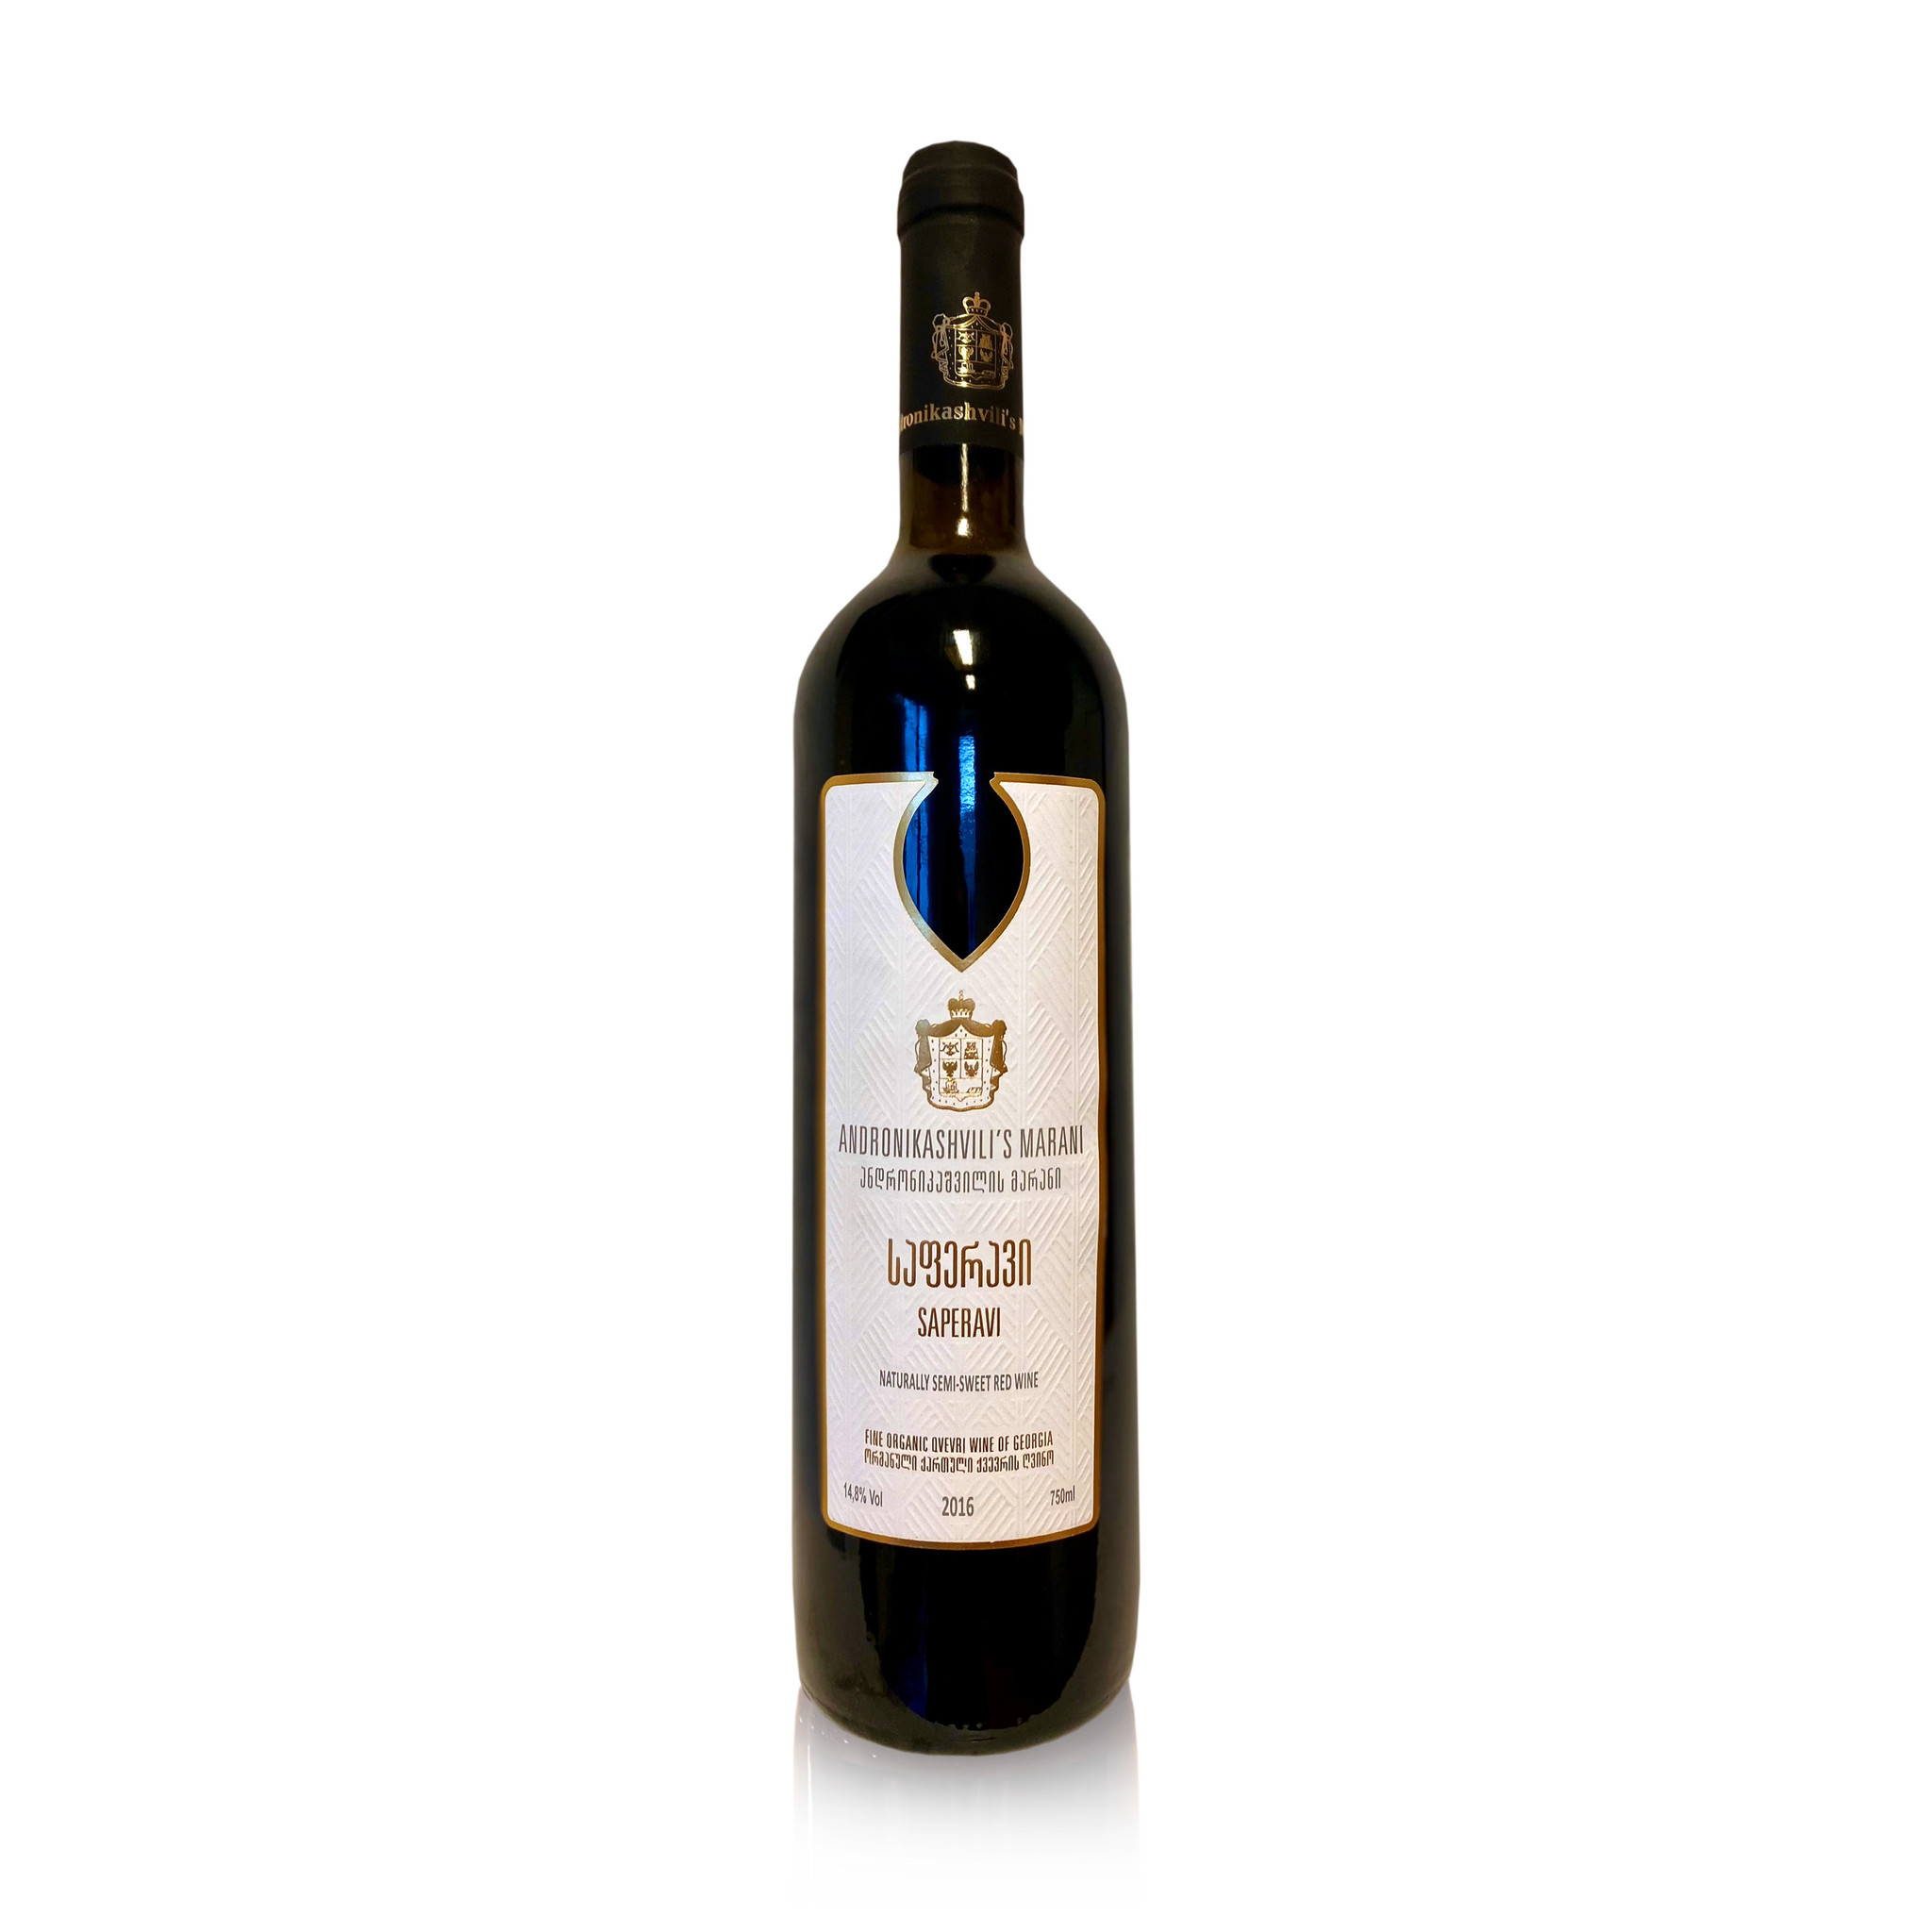 Andronikashvili Bio winery Saperavi [Bio] Semi-Sweet Red wine 2016